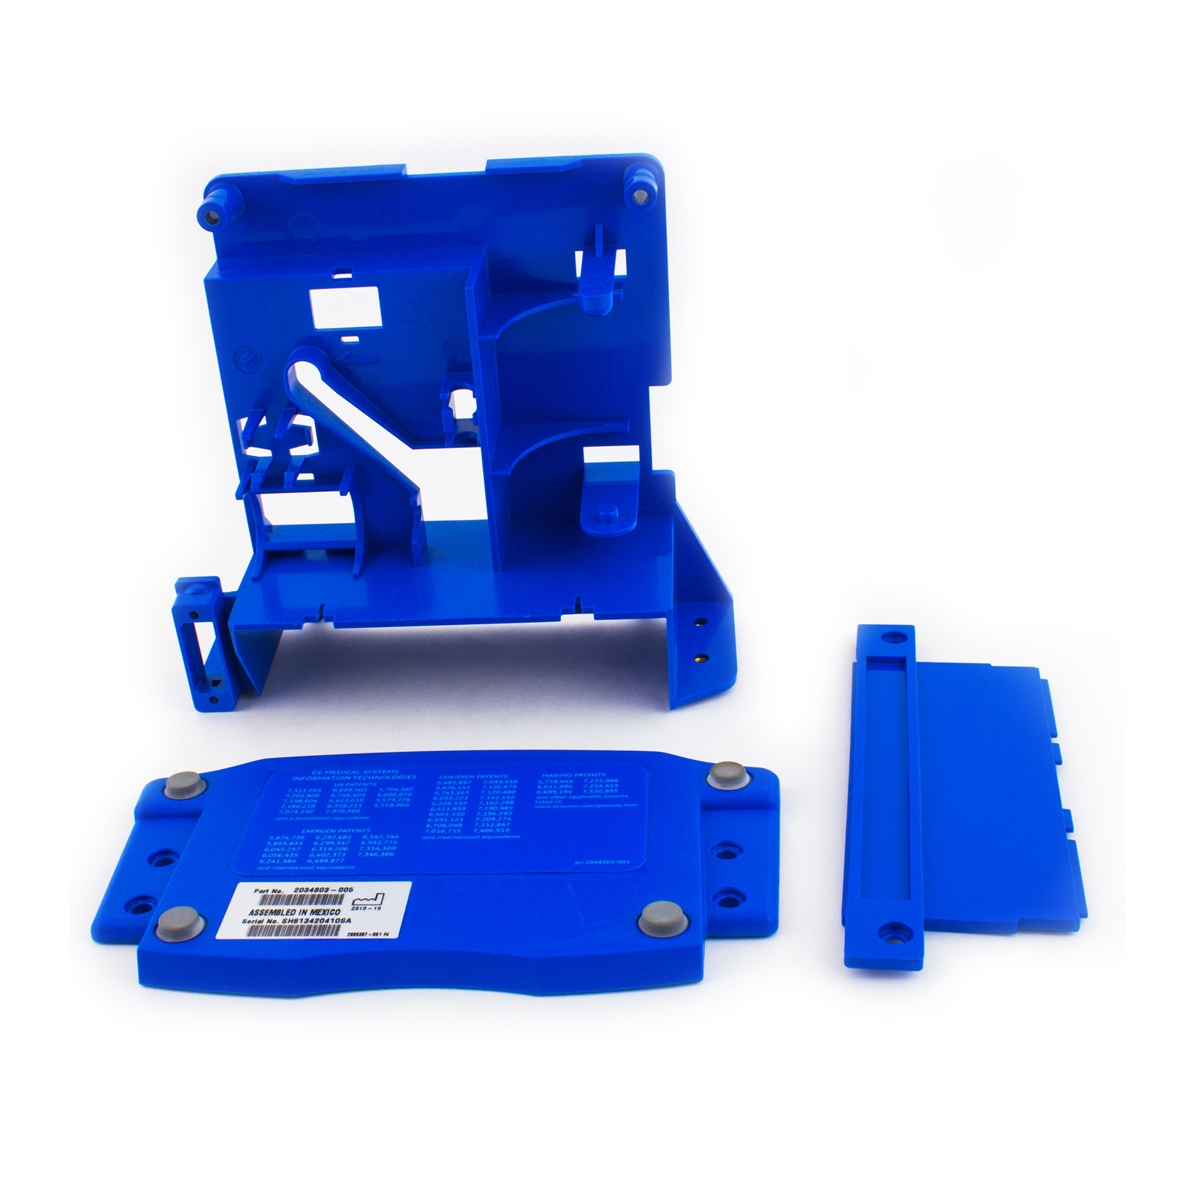 GE Carescape V100 Vital Signs Monitor Inner Frame Chassis Kit